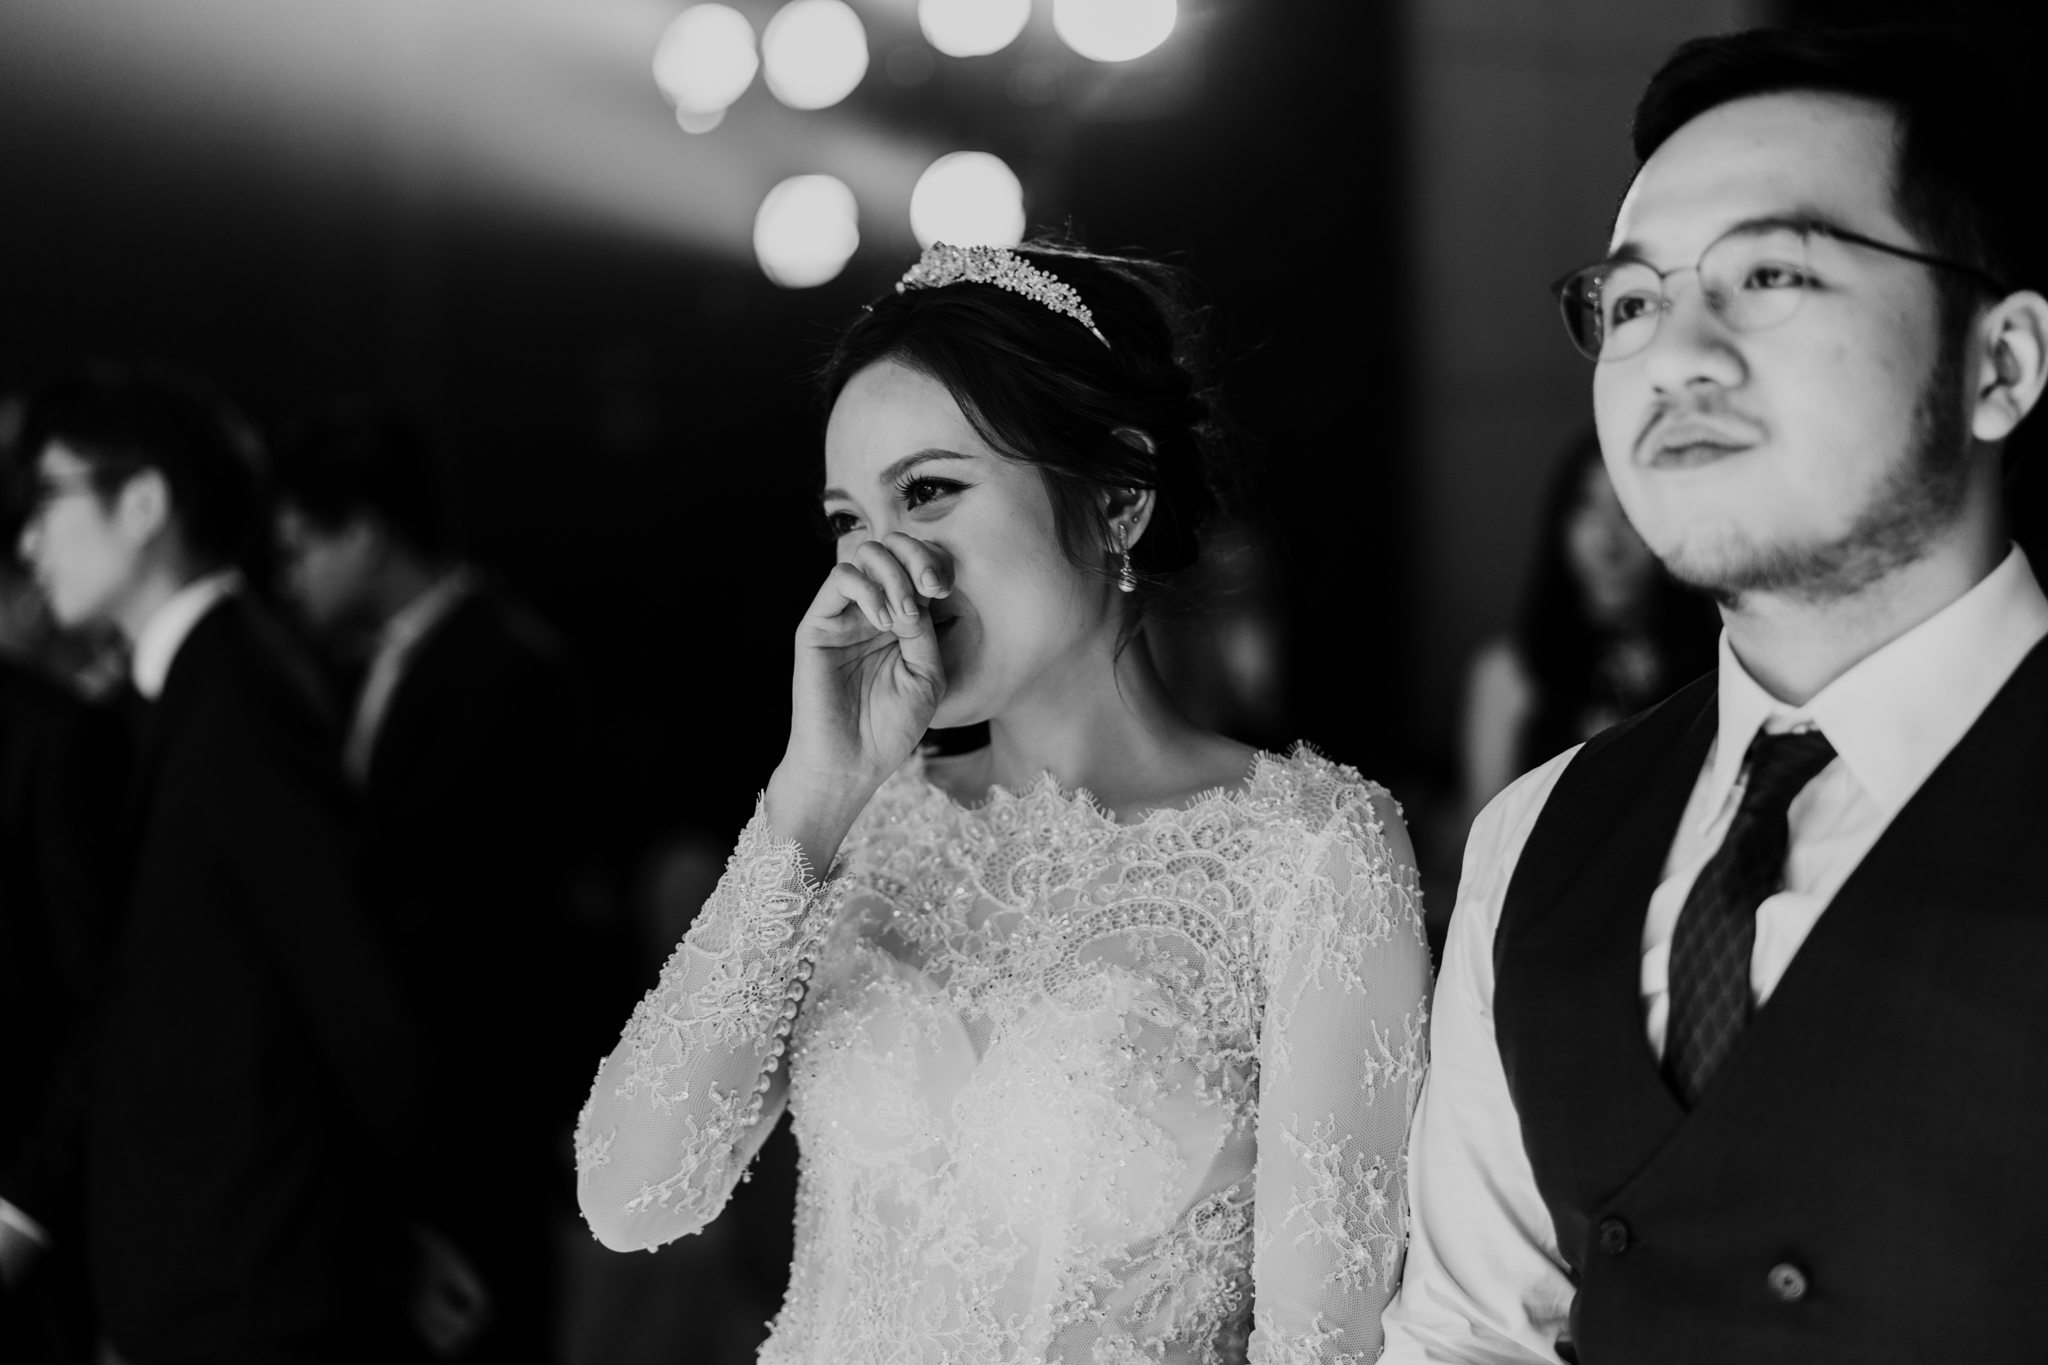 JWMarriott Ha Noi Intimate Wedding of Trang Hi well captured by Hipster Wedding Vietnam Wedding Photographer-97670.jpg